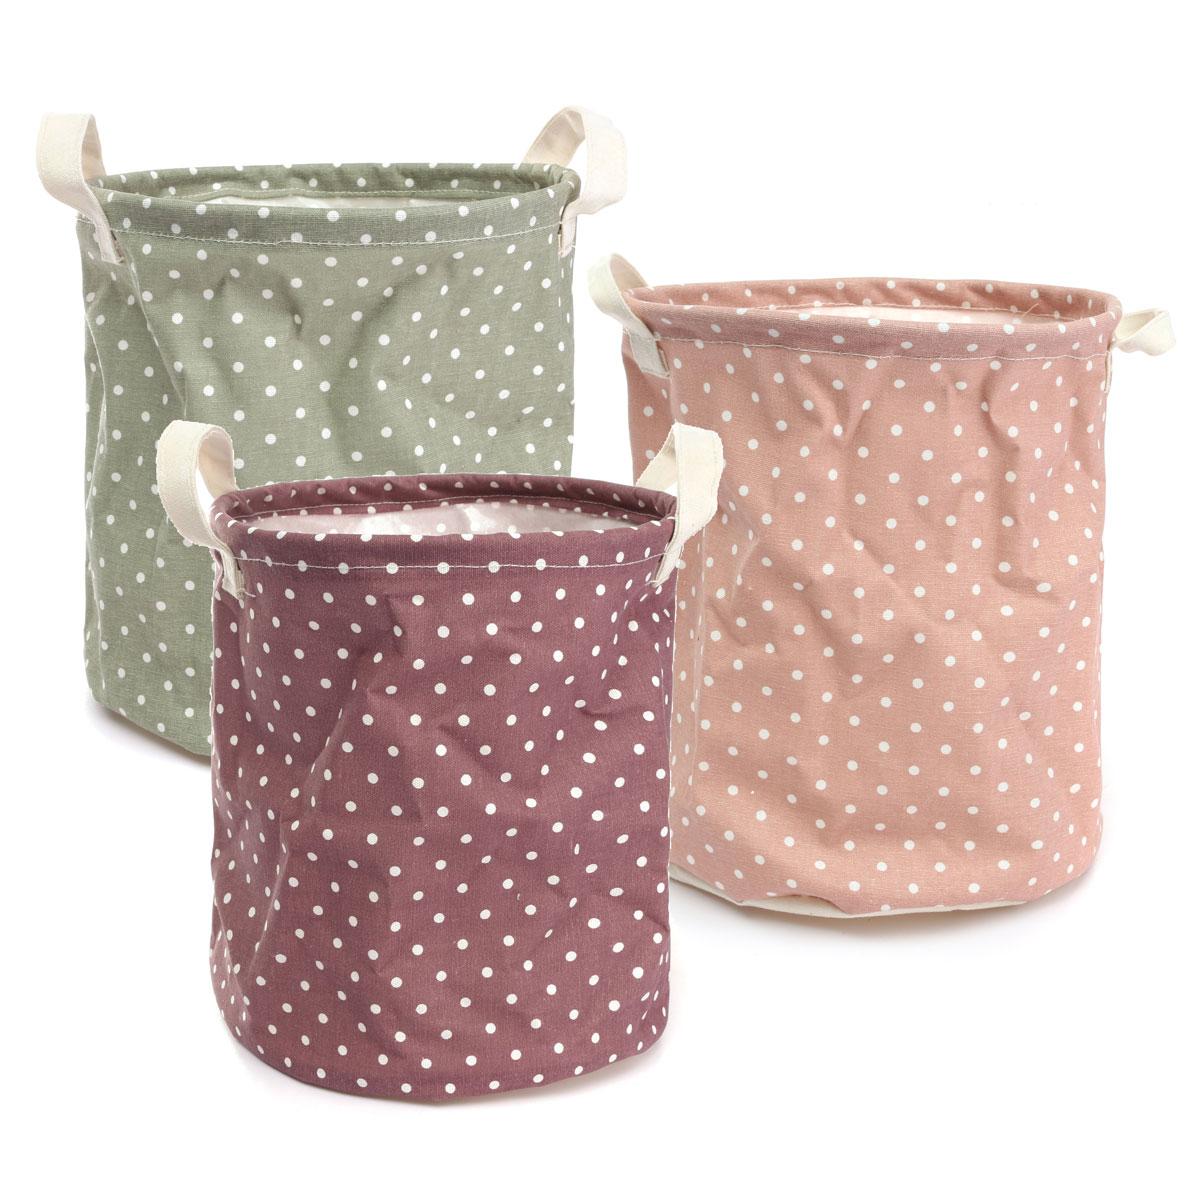 Novelty Cotton Linen Storage Barrels Laundry Basket Candy Colors Dot Hamper Dirty Clothes Basket Organizer Bucket 23x26cm(China (Mainland))